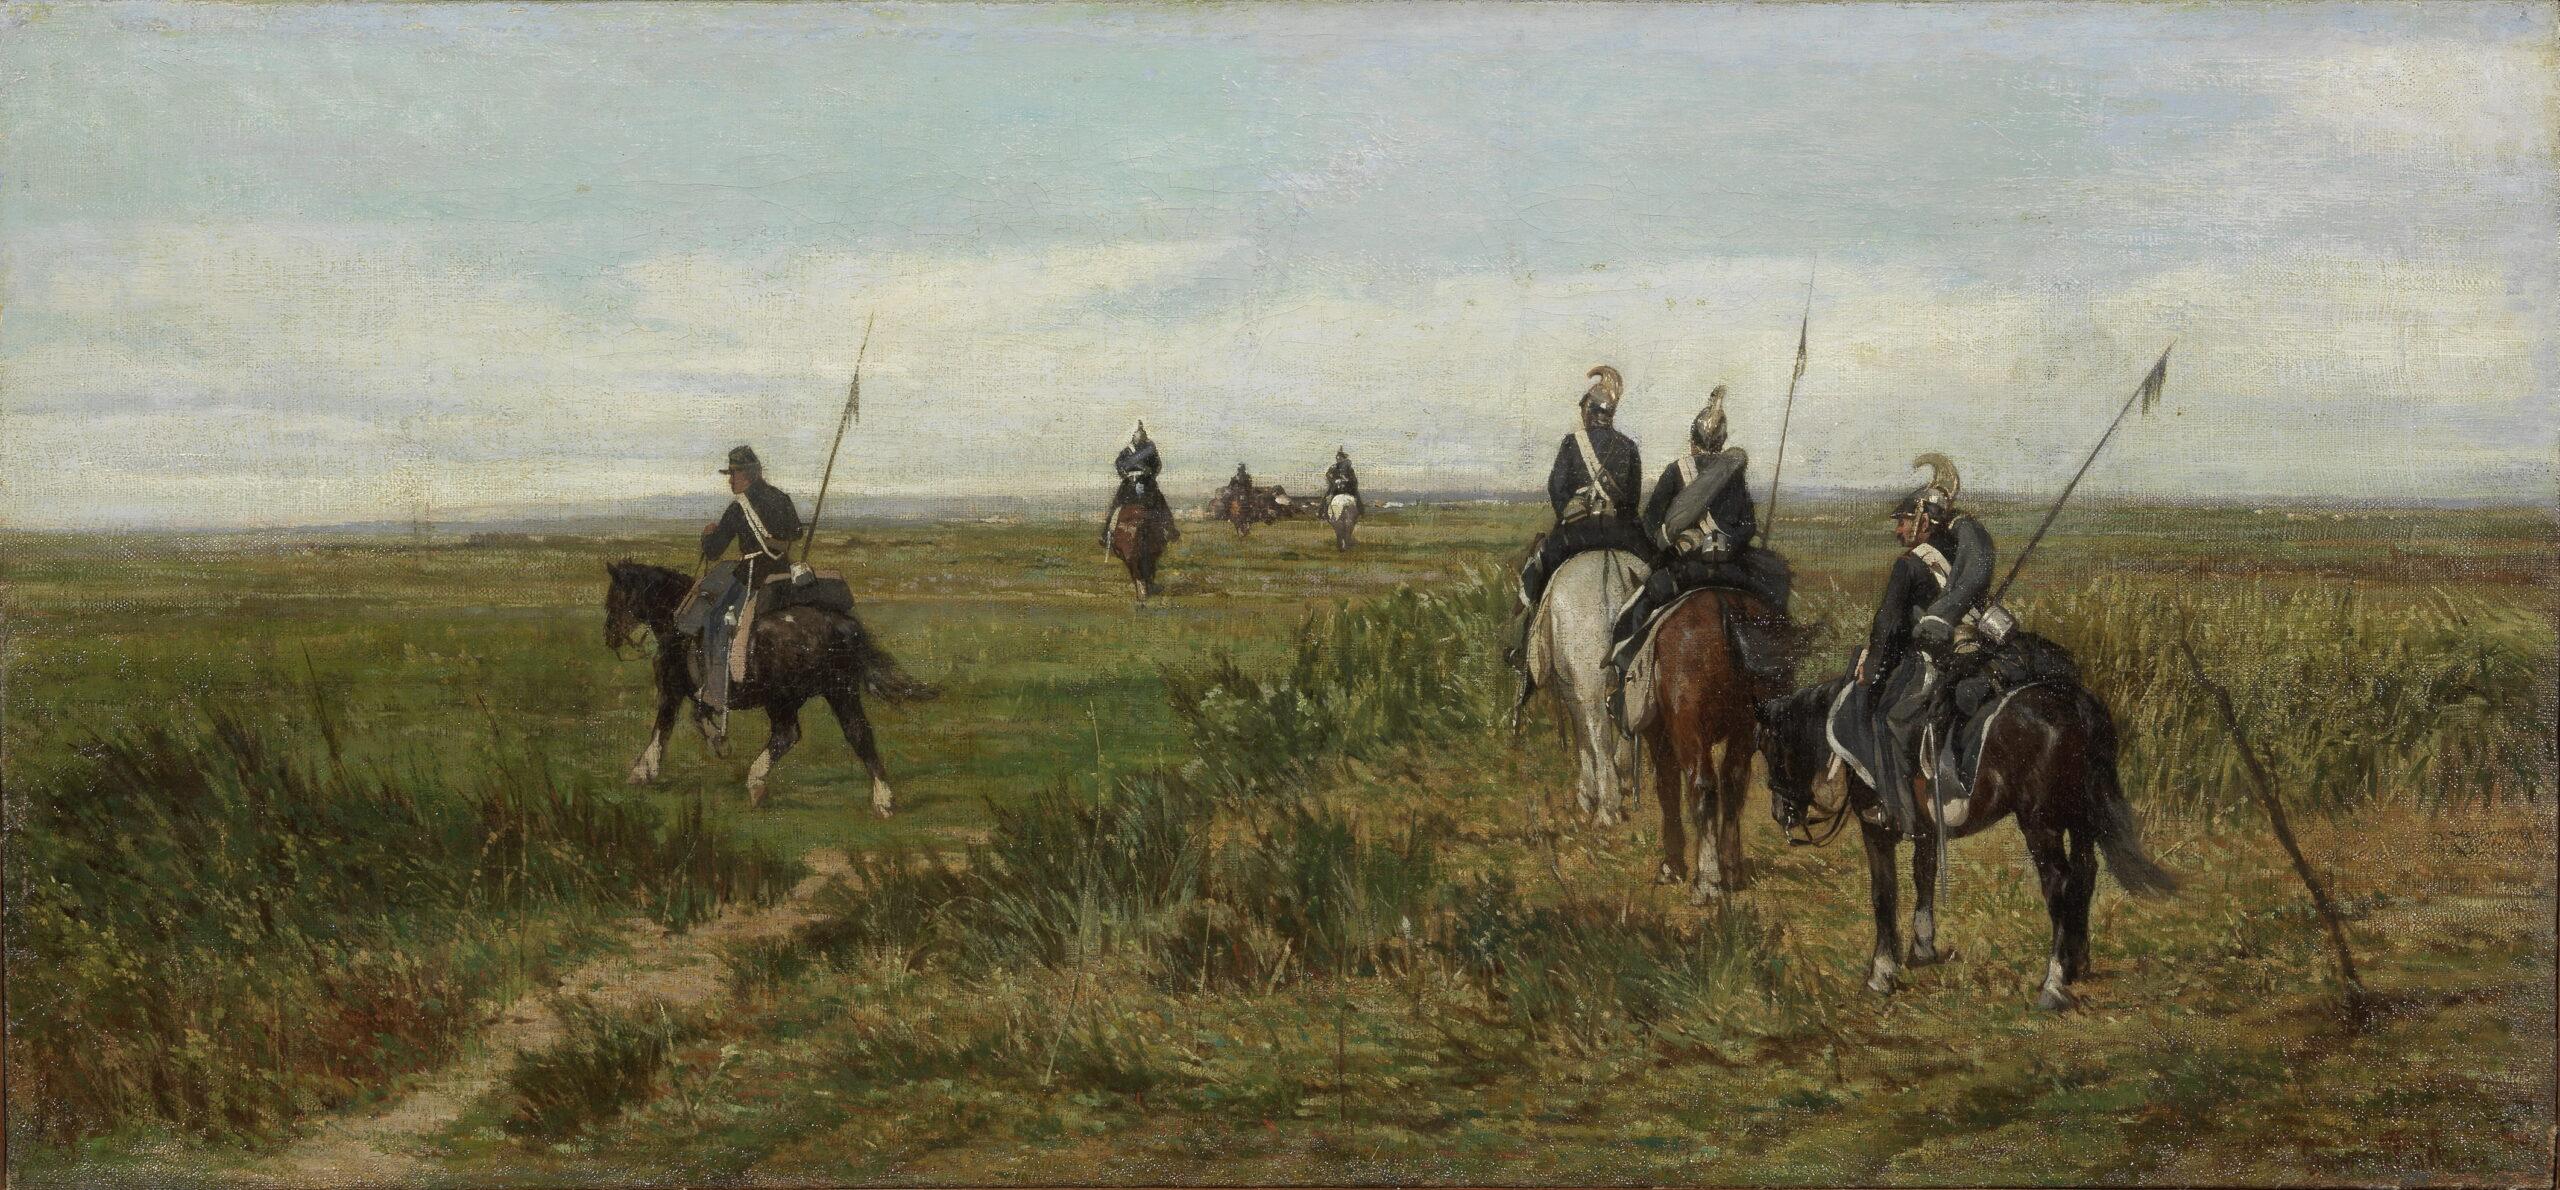 Giovanni Fattori, Avanscoperta, olio su tela 45 x 98,5 cm